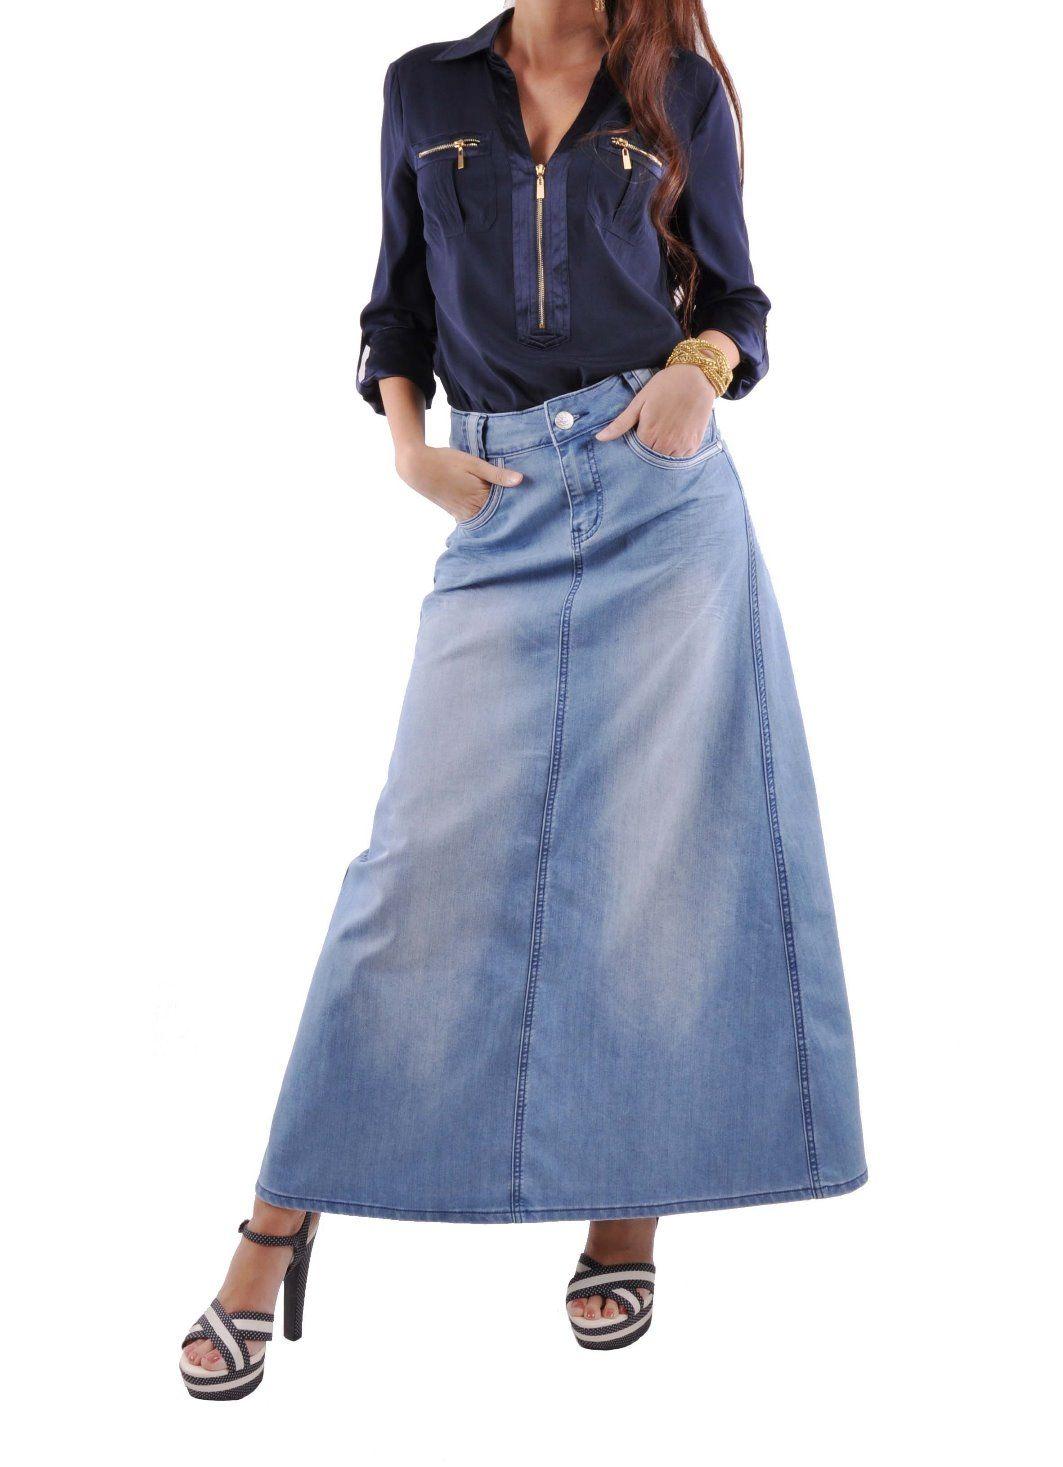 c9be653ed1 Rosie Chic Long Denim Skirt   My Style   Denim skirt, Skirts, Plus size  skirts